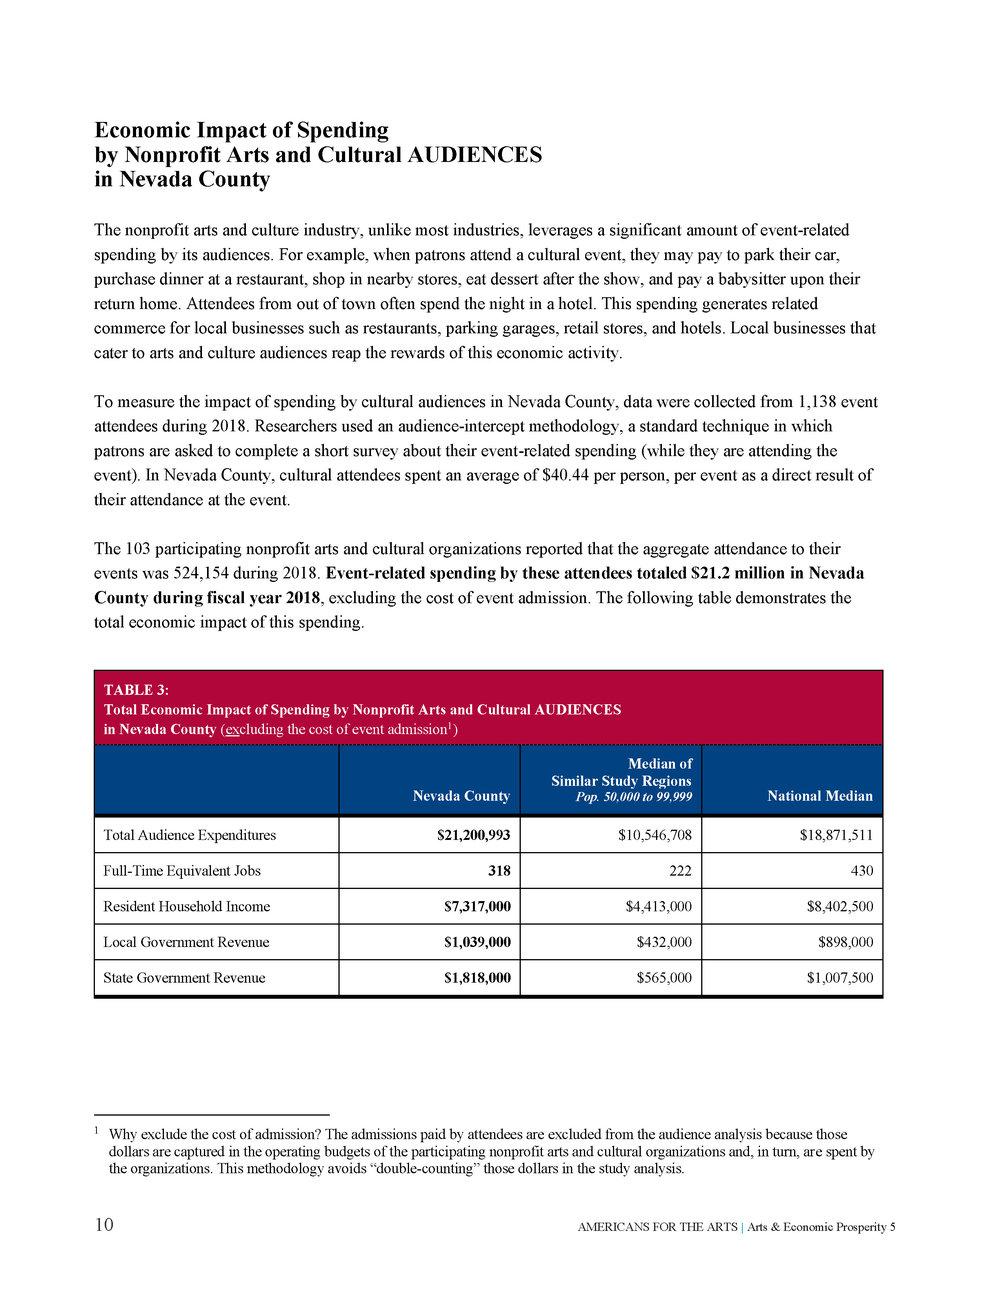 Arts & Economic Prosperity in Nevada County_Page_14.jpg